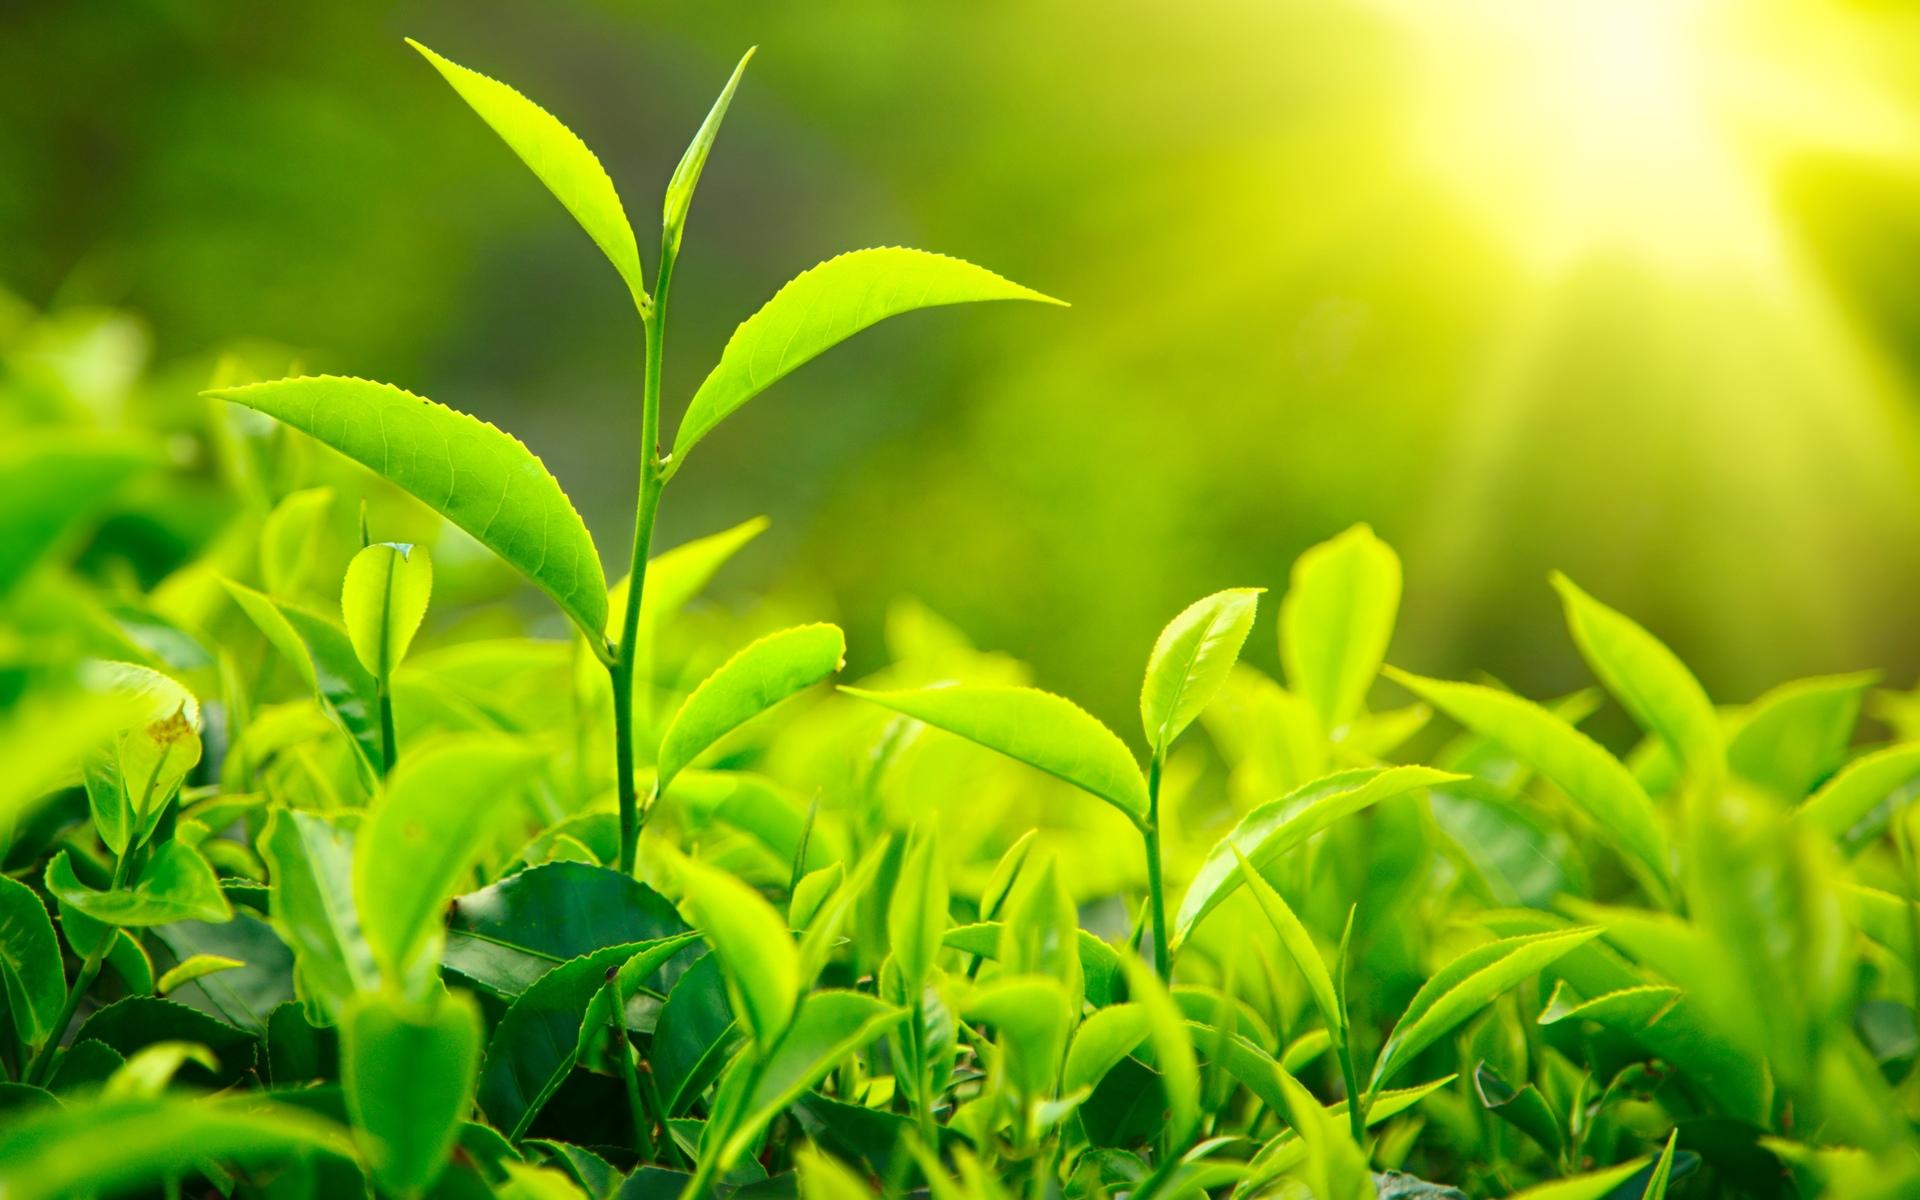 HOW PLANT MAKE FOOD (with image) · ProfKarim · Storify